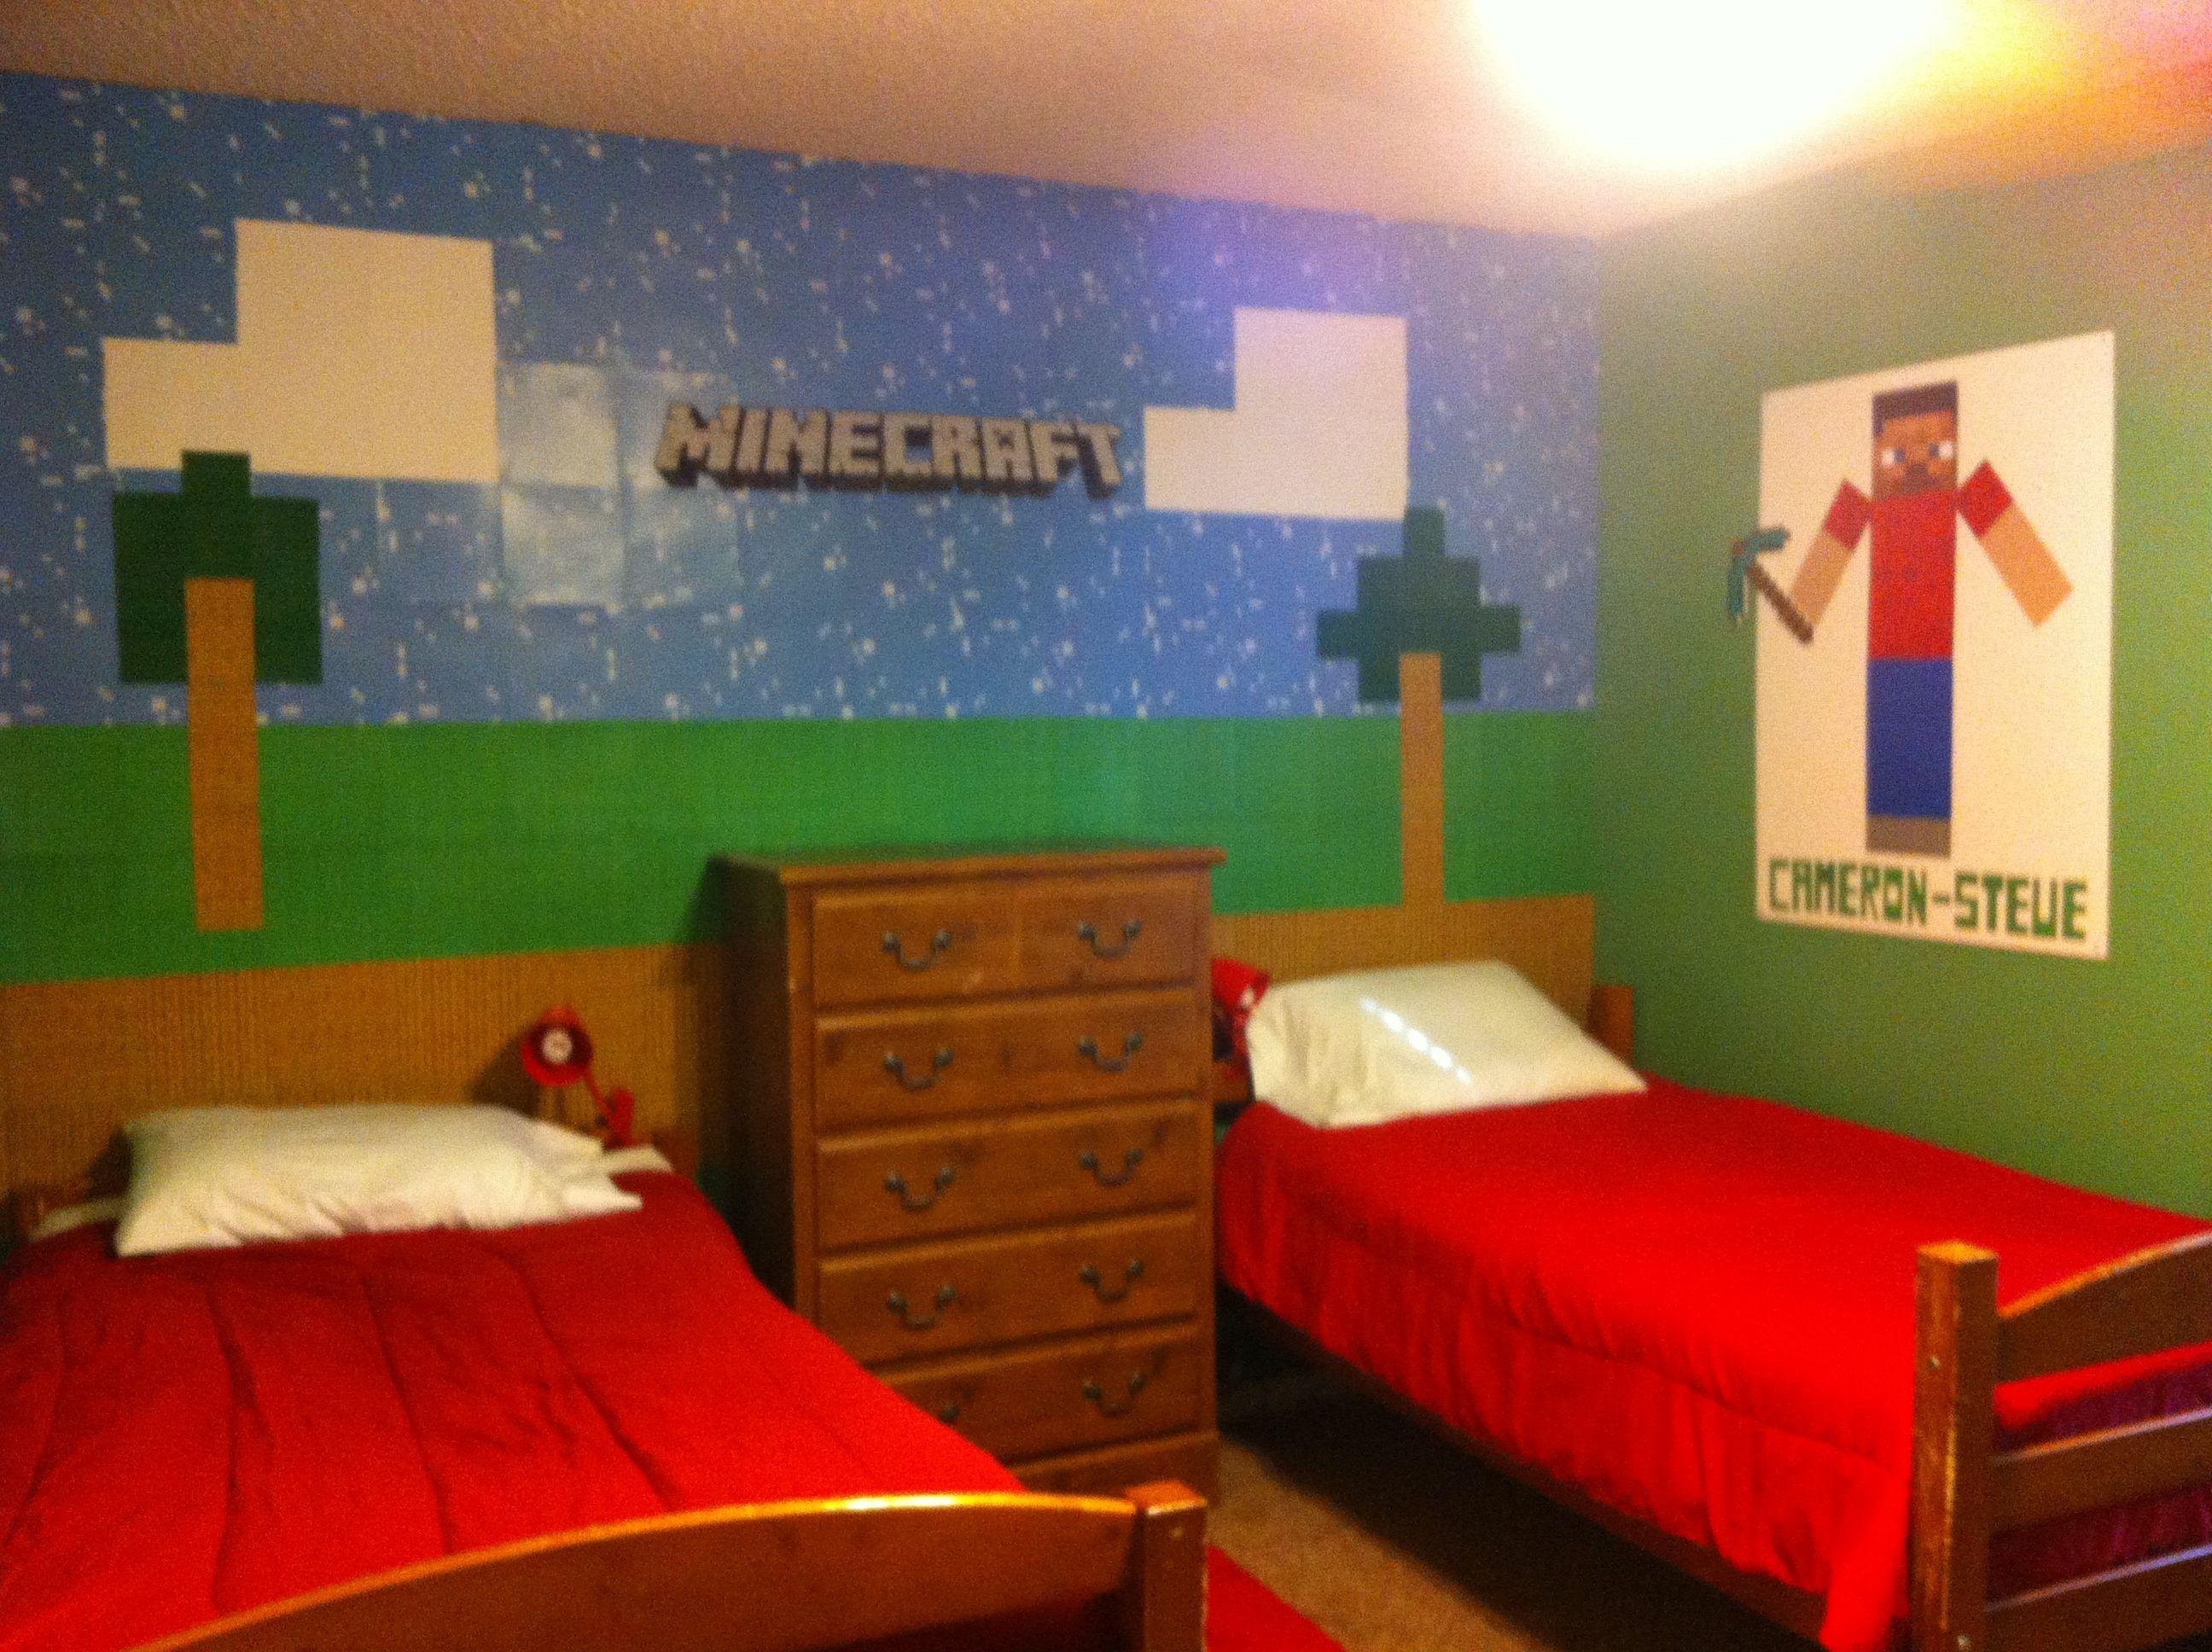 Minecraft room pic2  INSPIRATION MINECRAFT  Pinterest